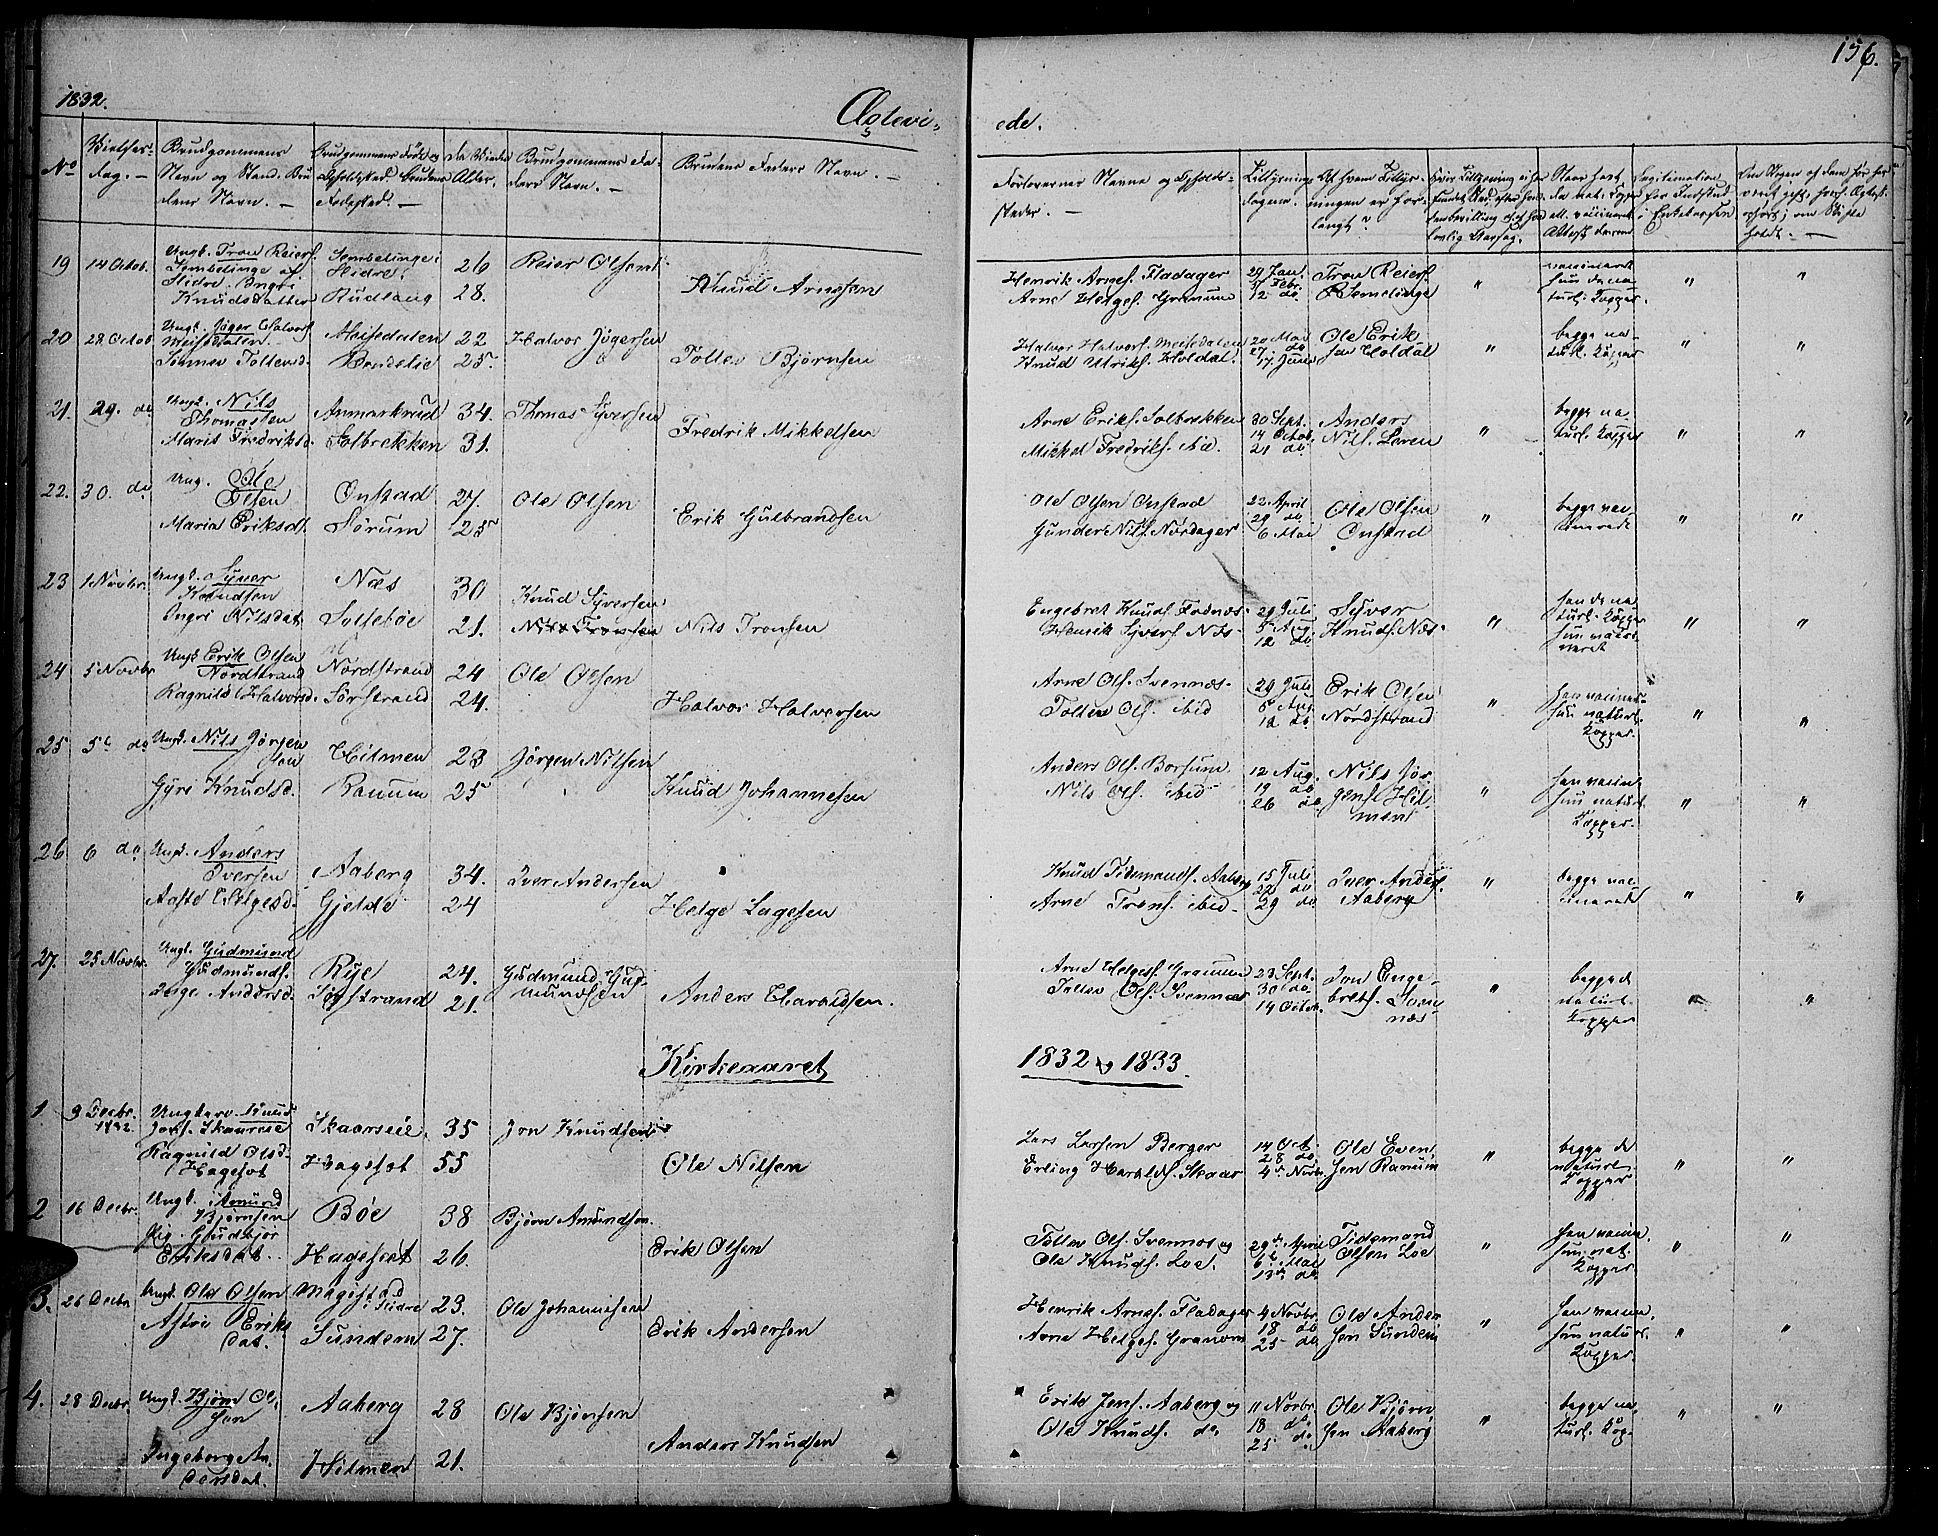 SAH, Nord-Aurdal prestekontor, Ministerialbok nr. 3, 1828-1841, s. 156